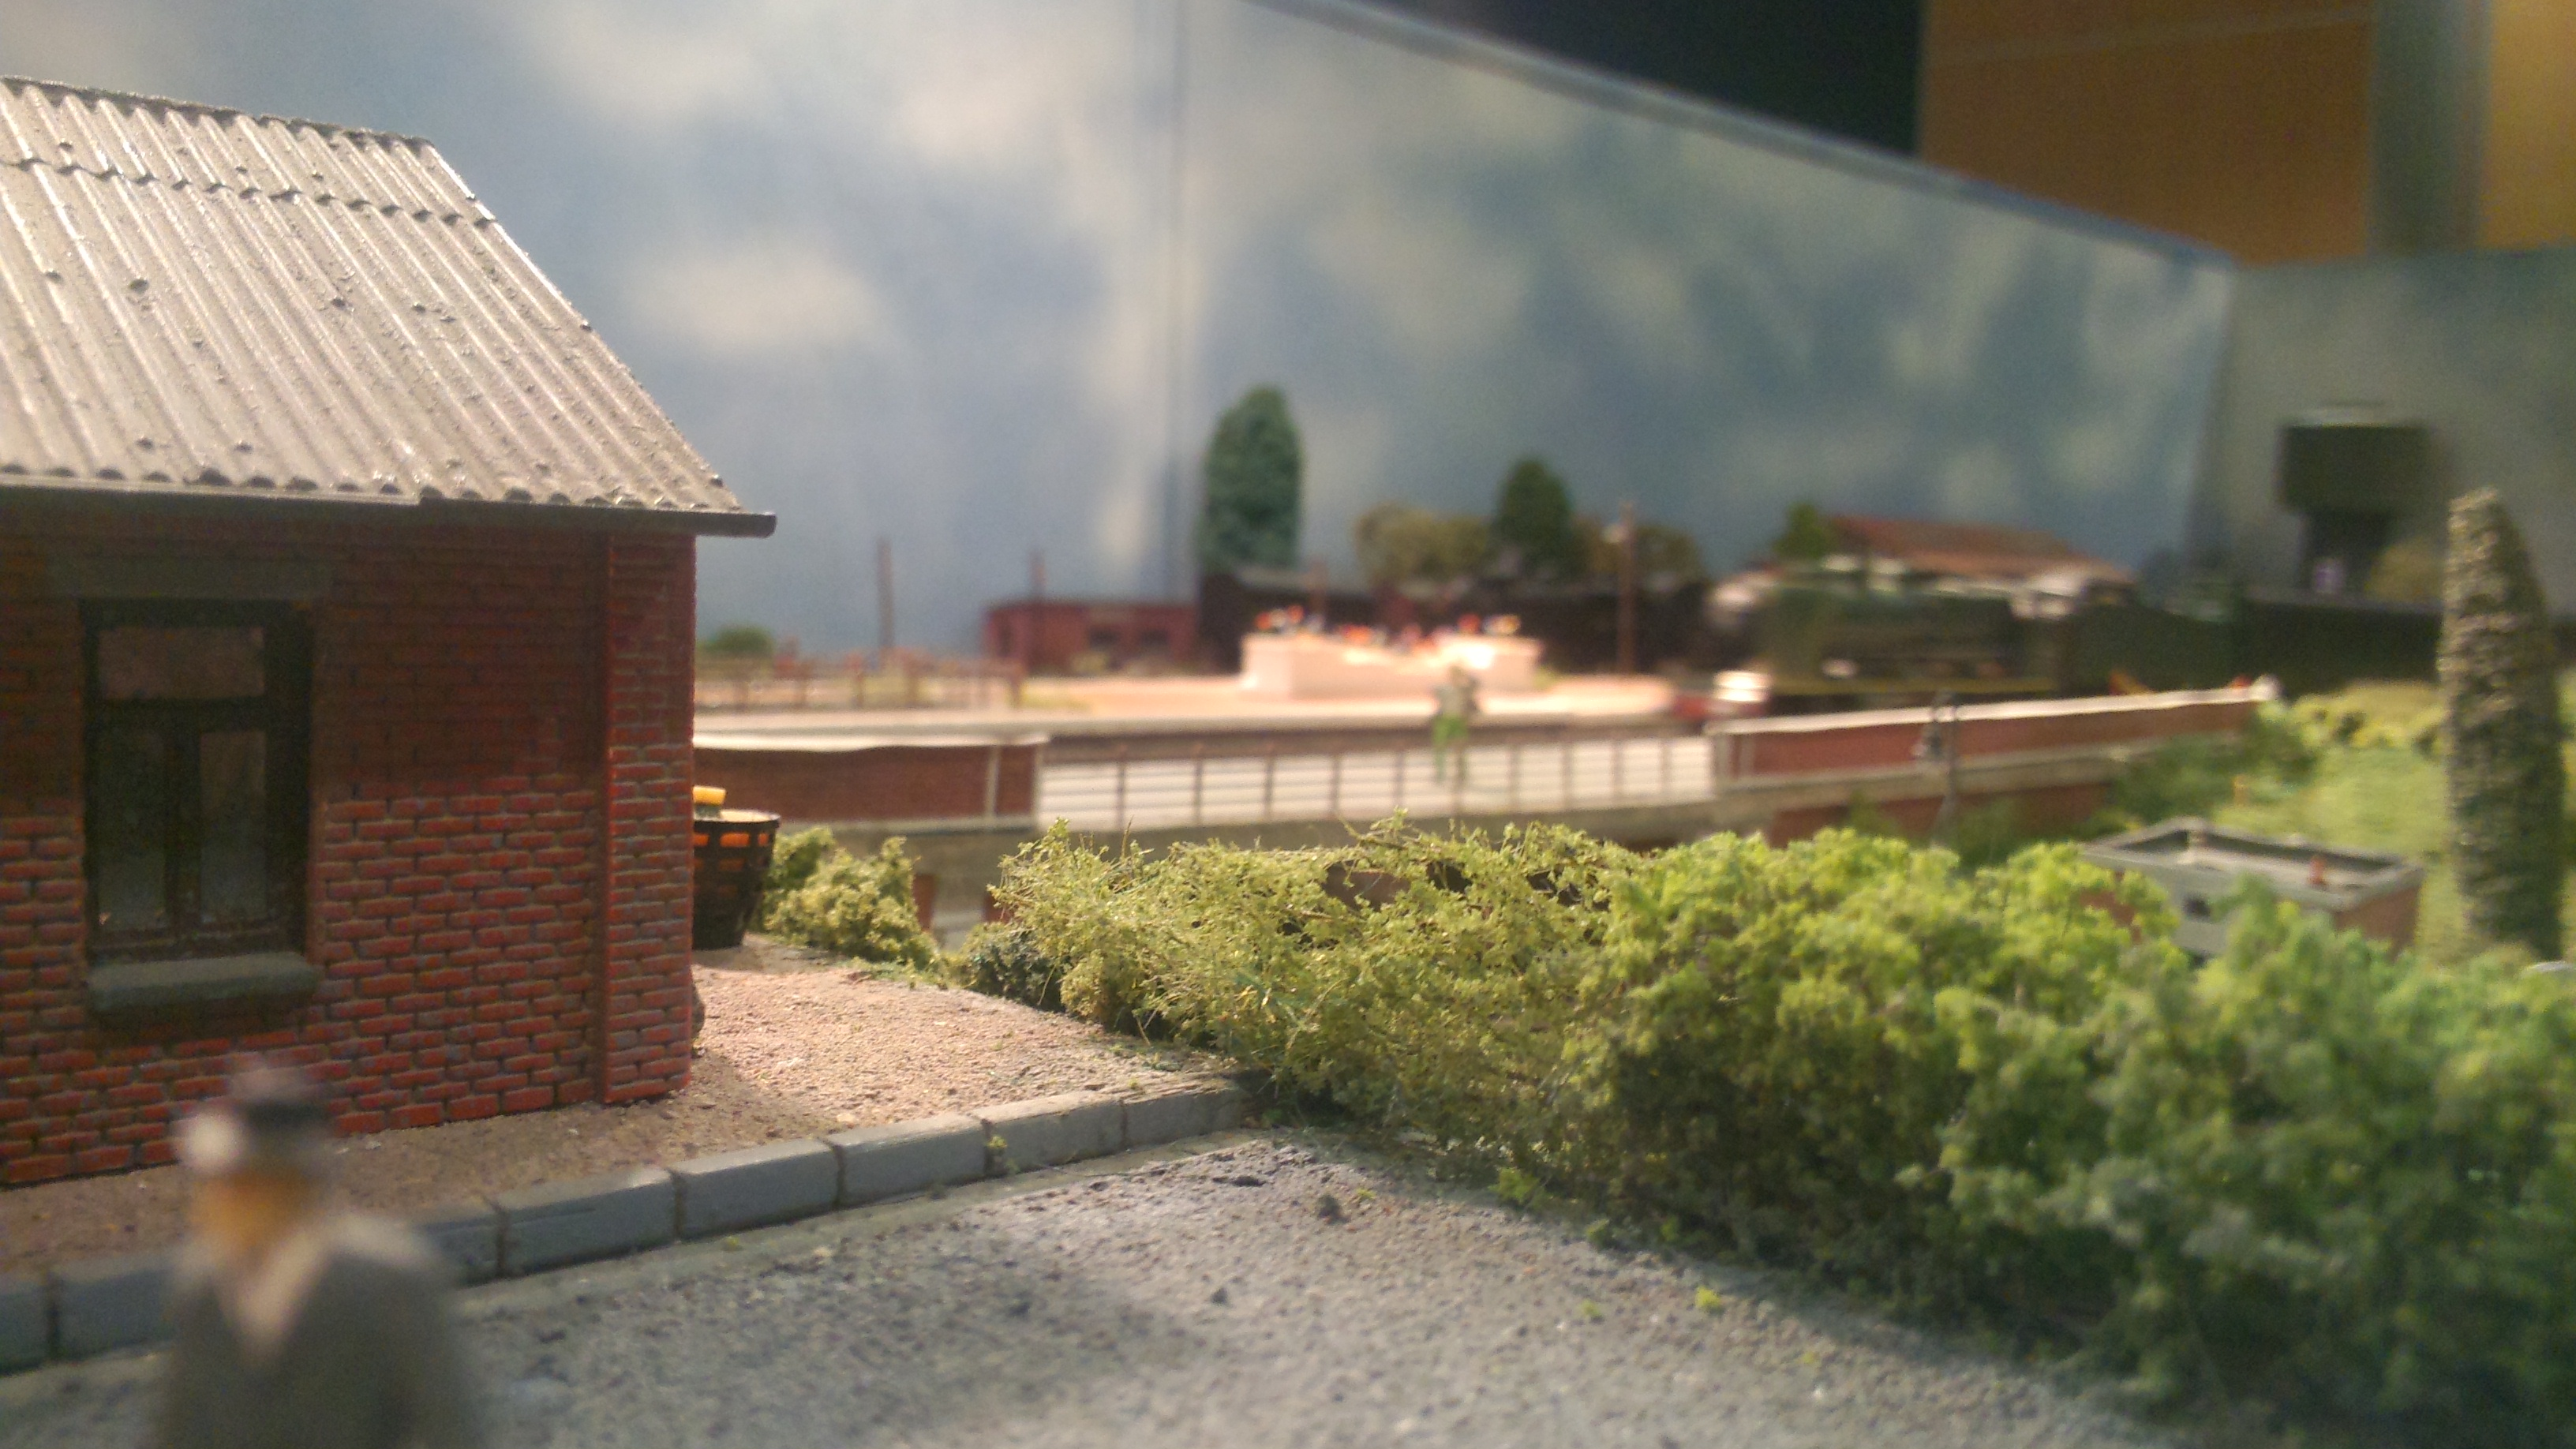 Le module de la gare de Saint-Omer